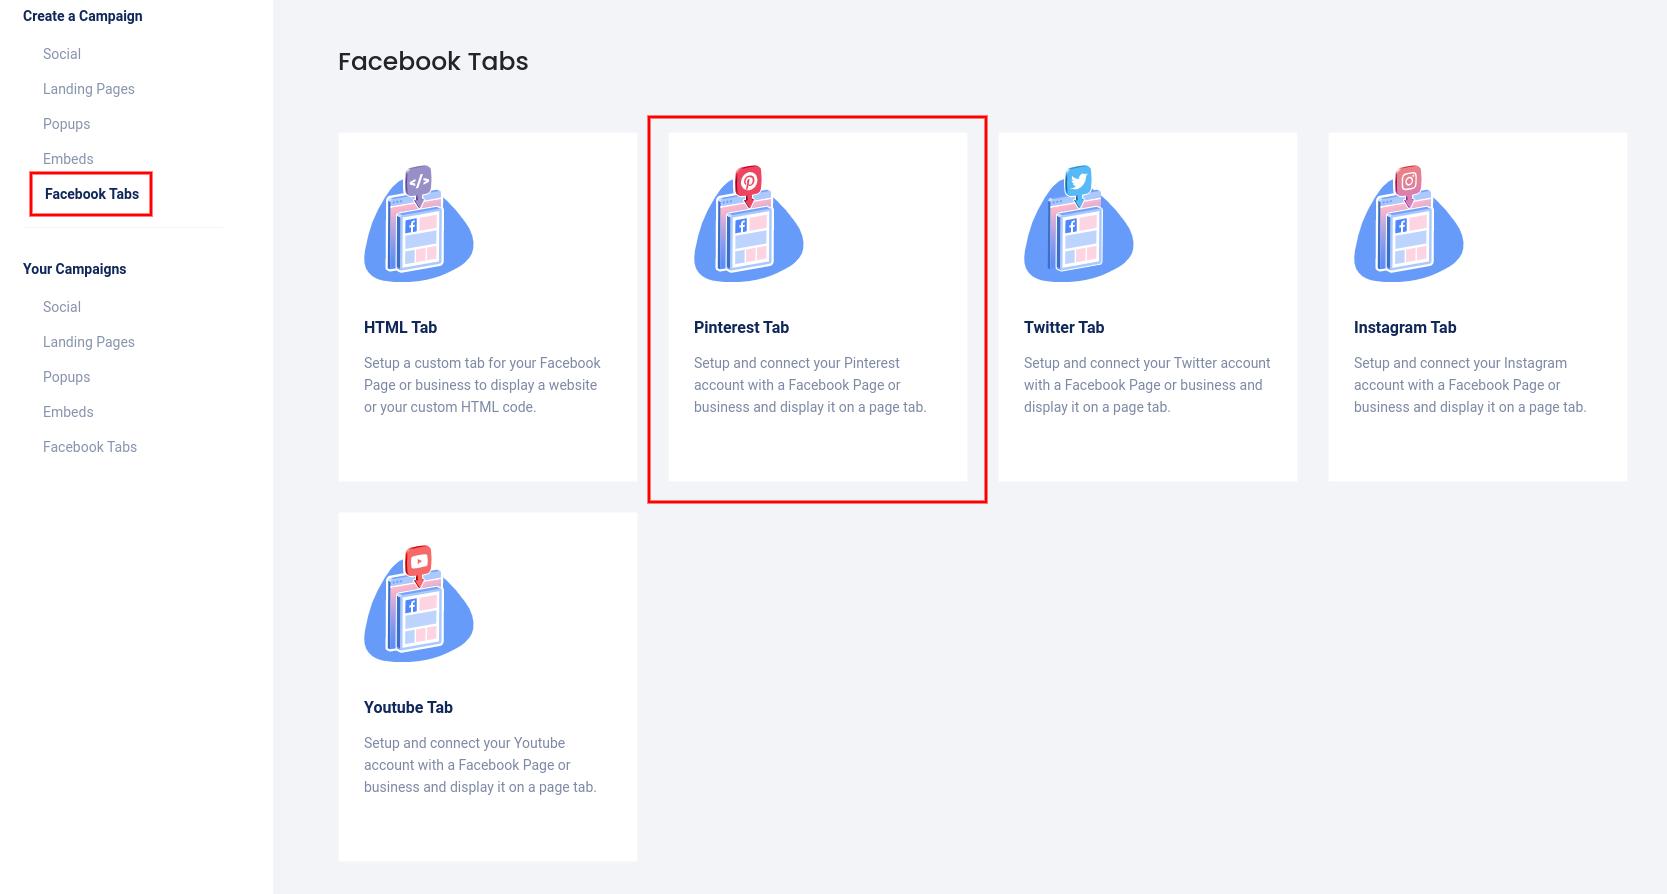 Facebook tabs - Pinterest tab